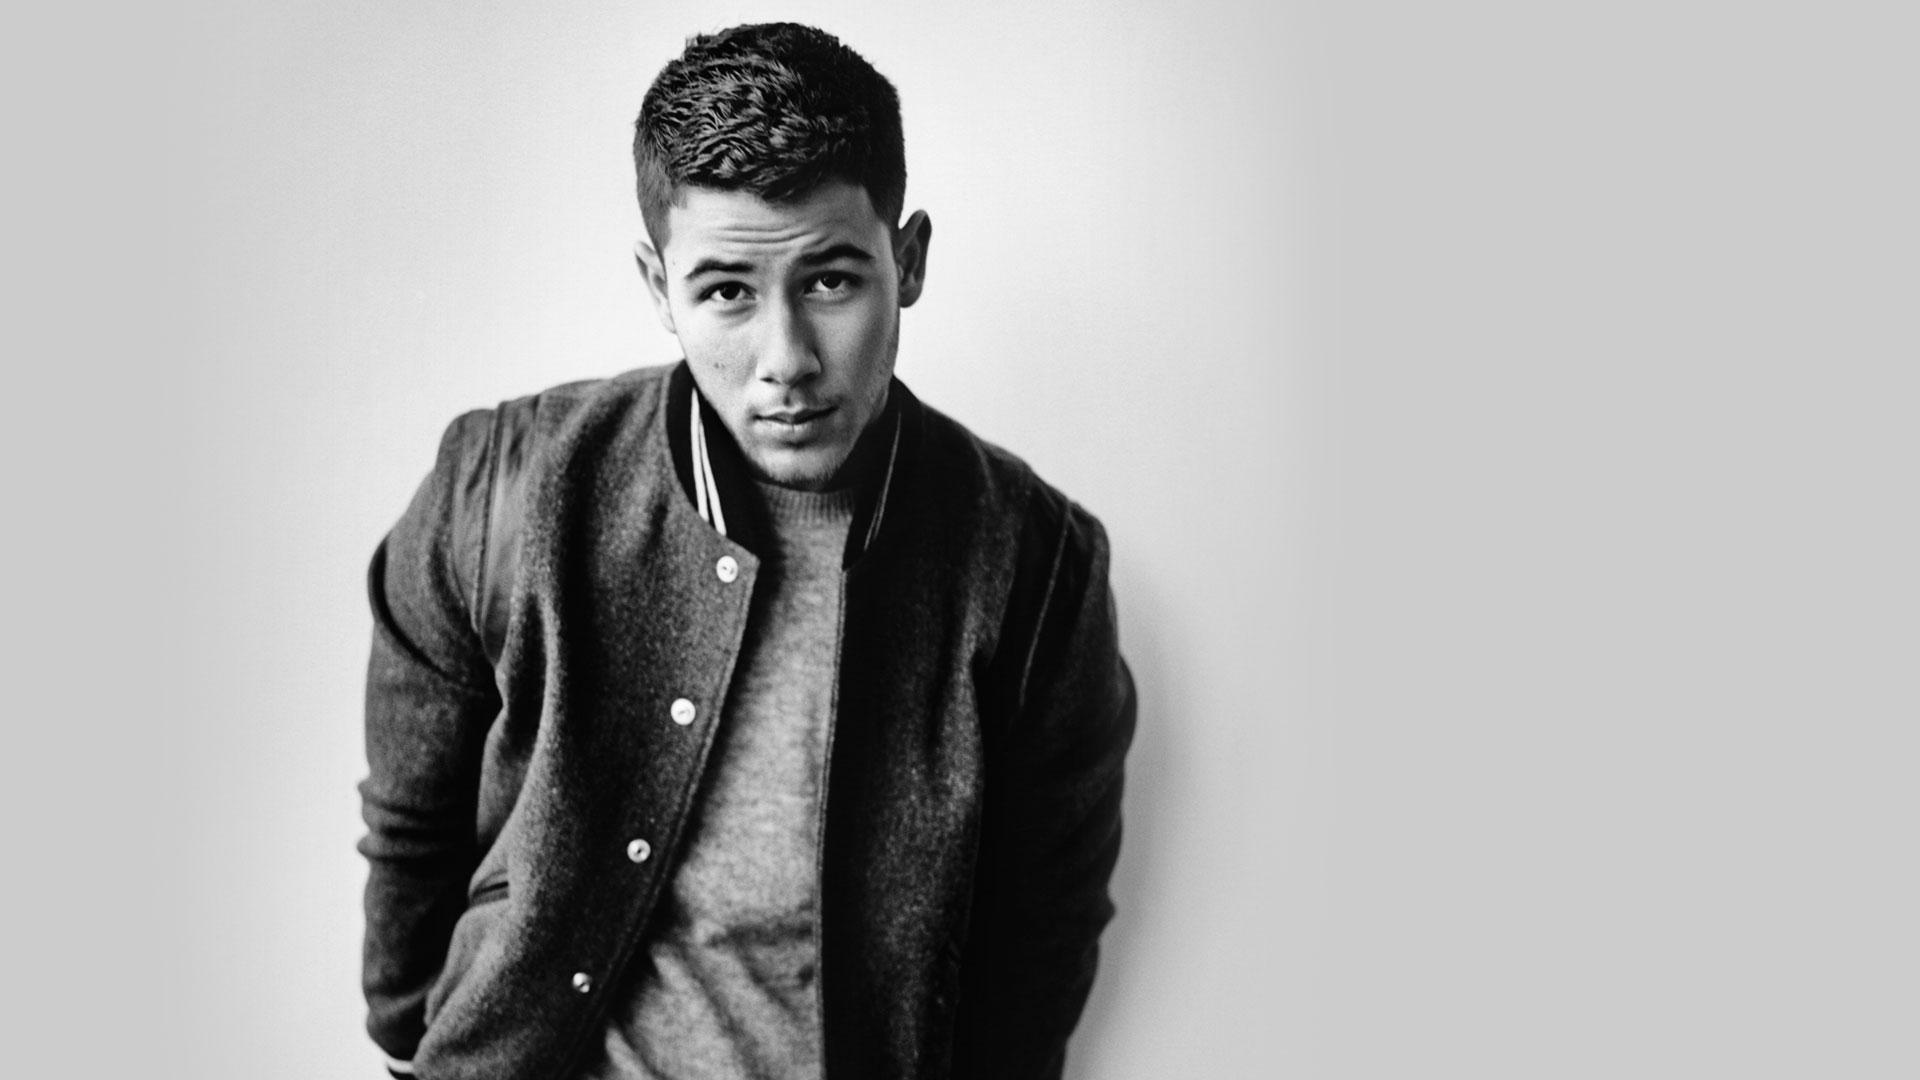 Nick Jonas Wallpaper